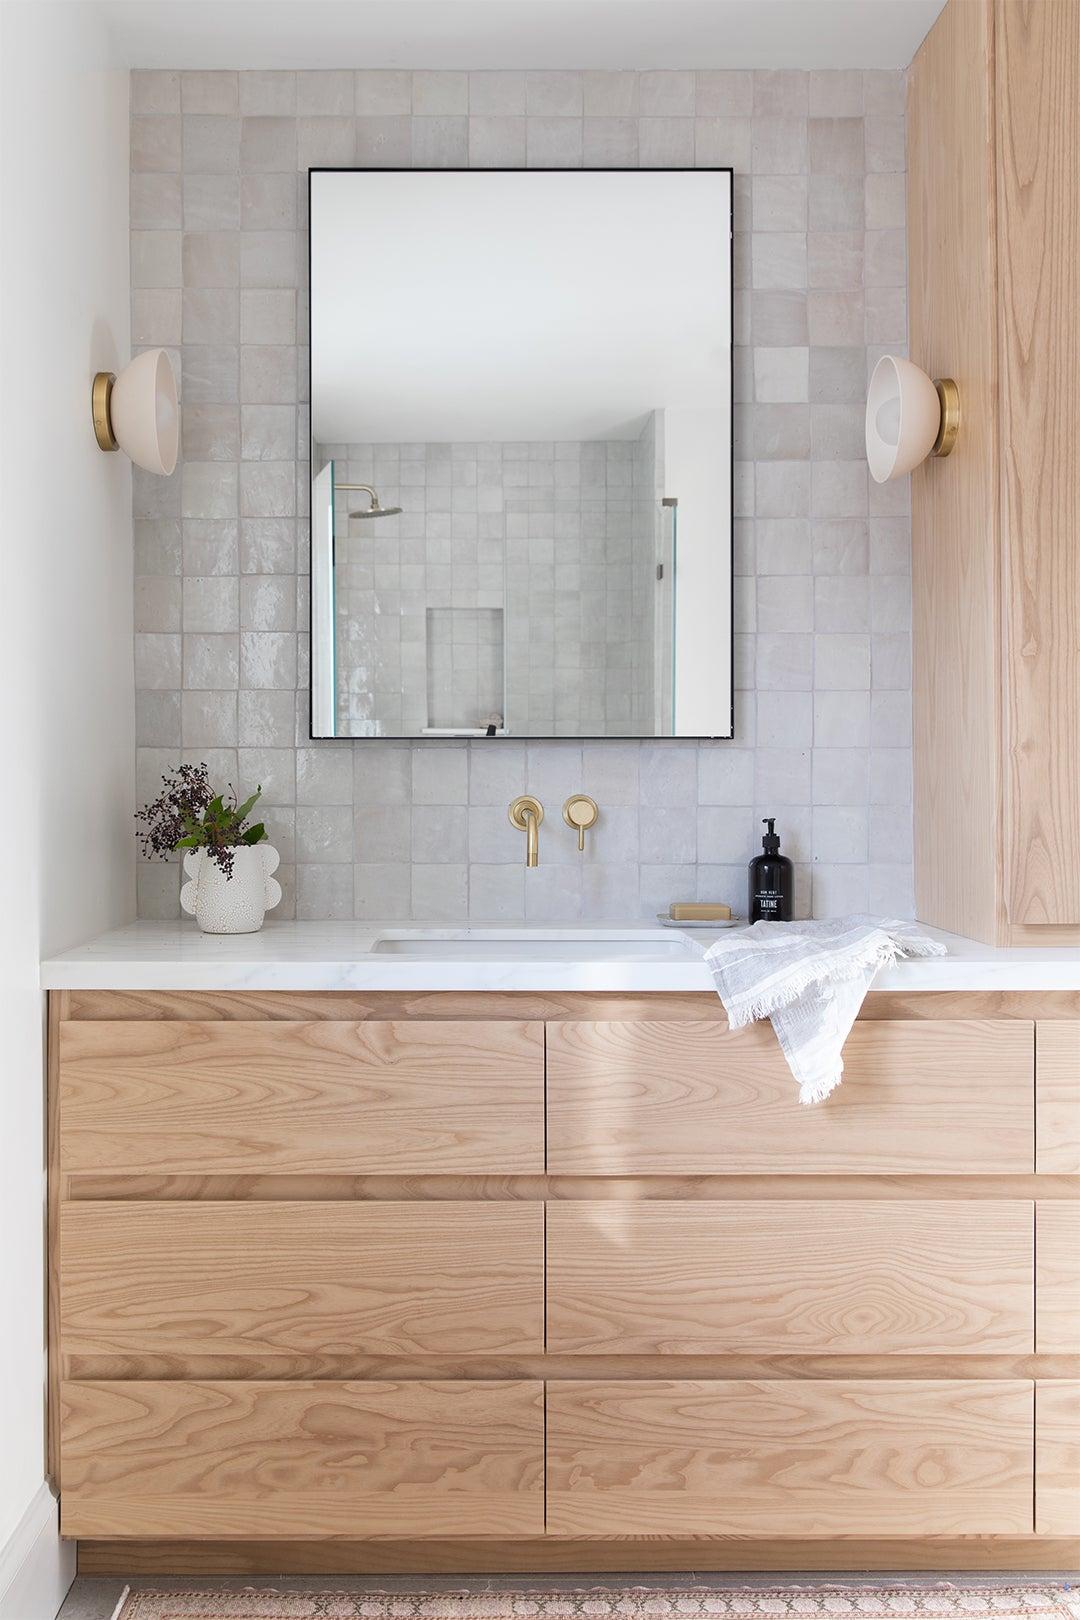 Bathroom with zellige tile and light oak cabinets